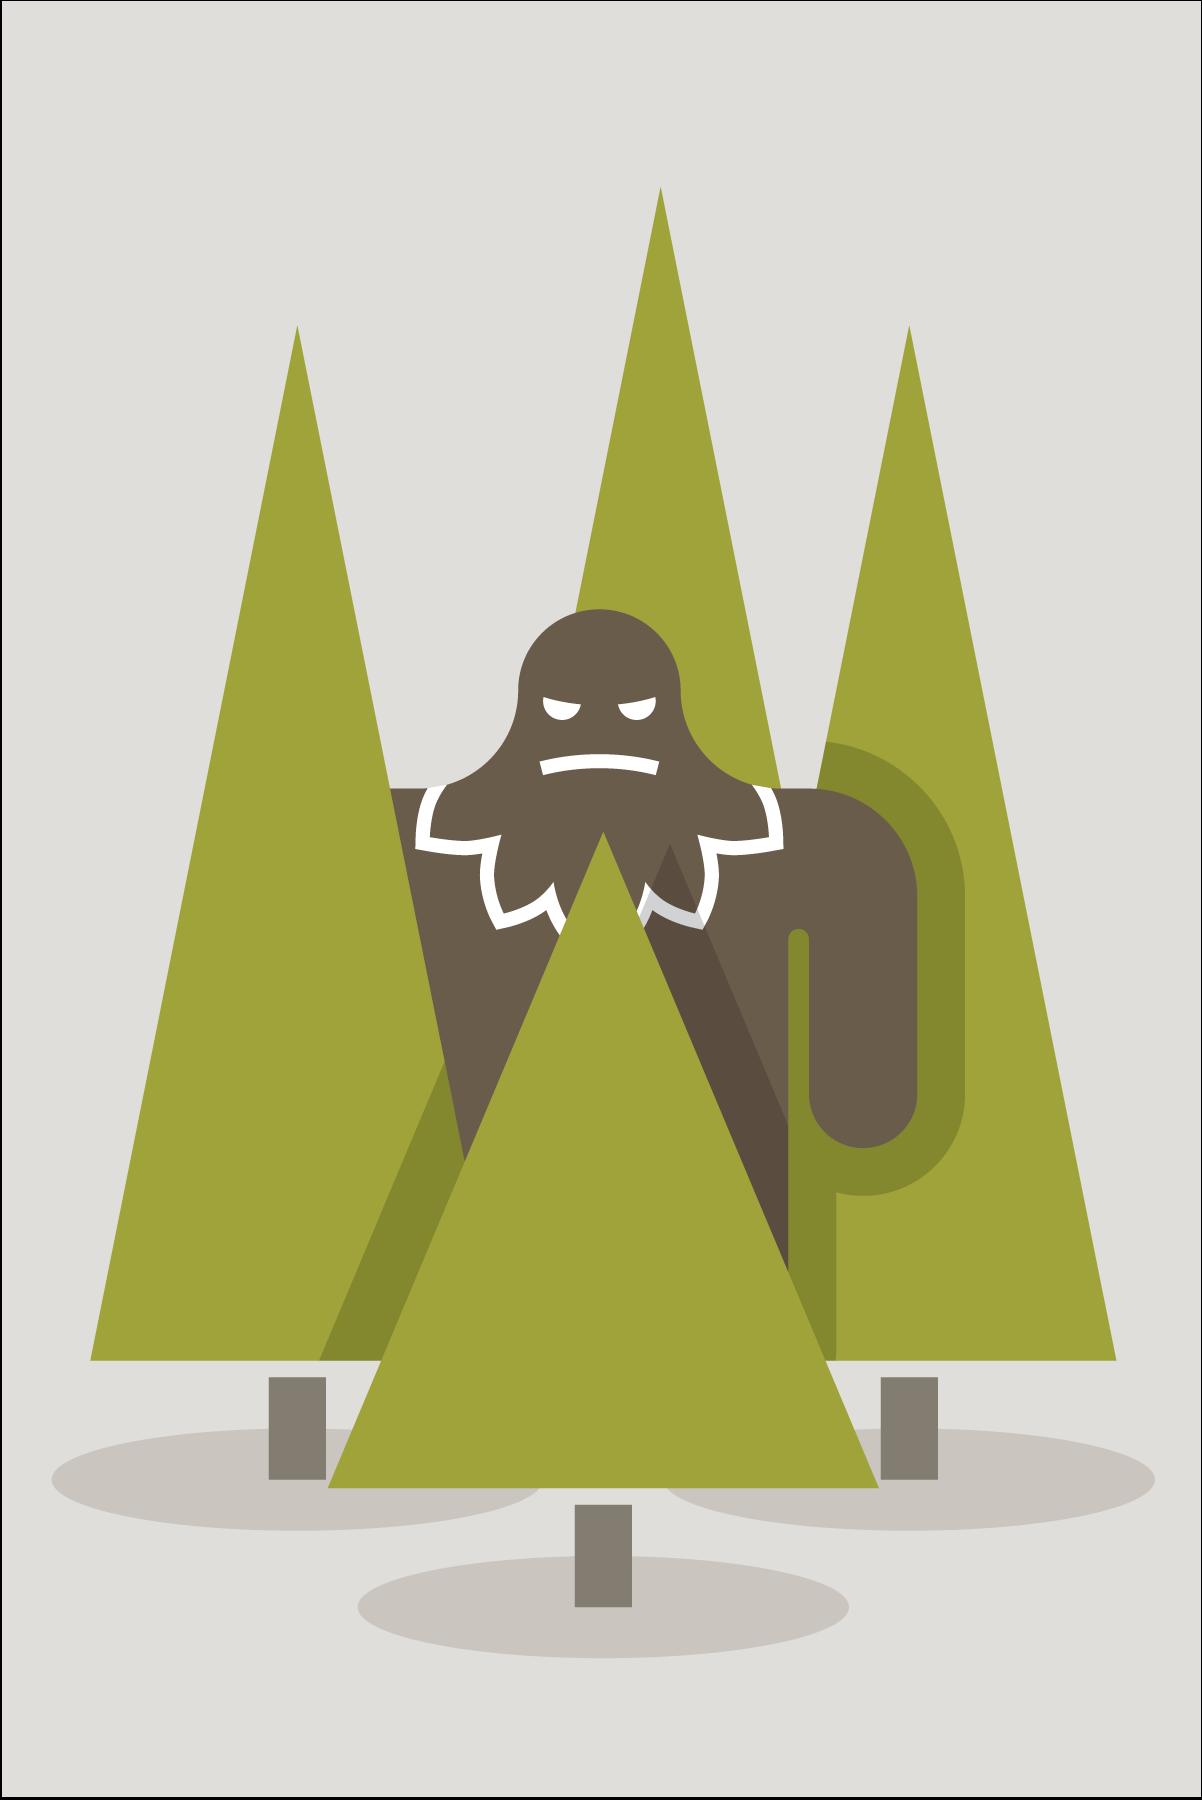 Sasquatch illustration by Mark Mularz of Fetch Design